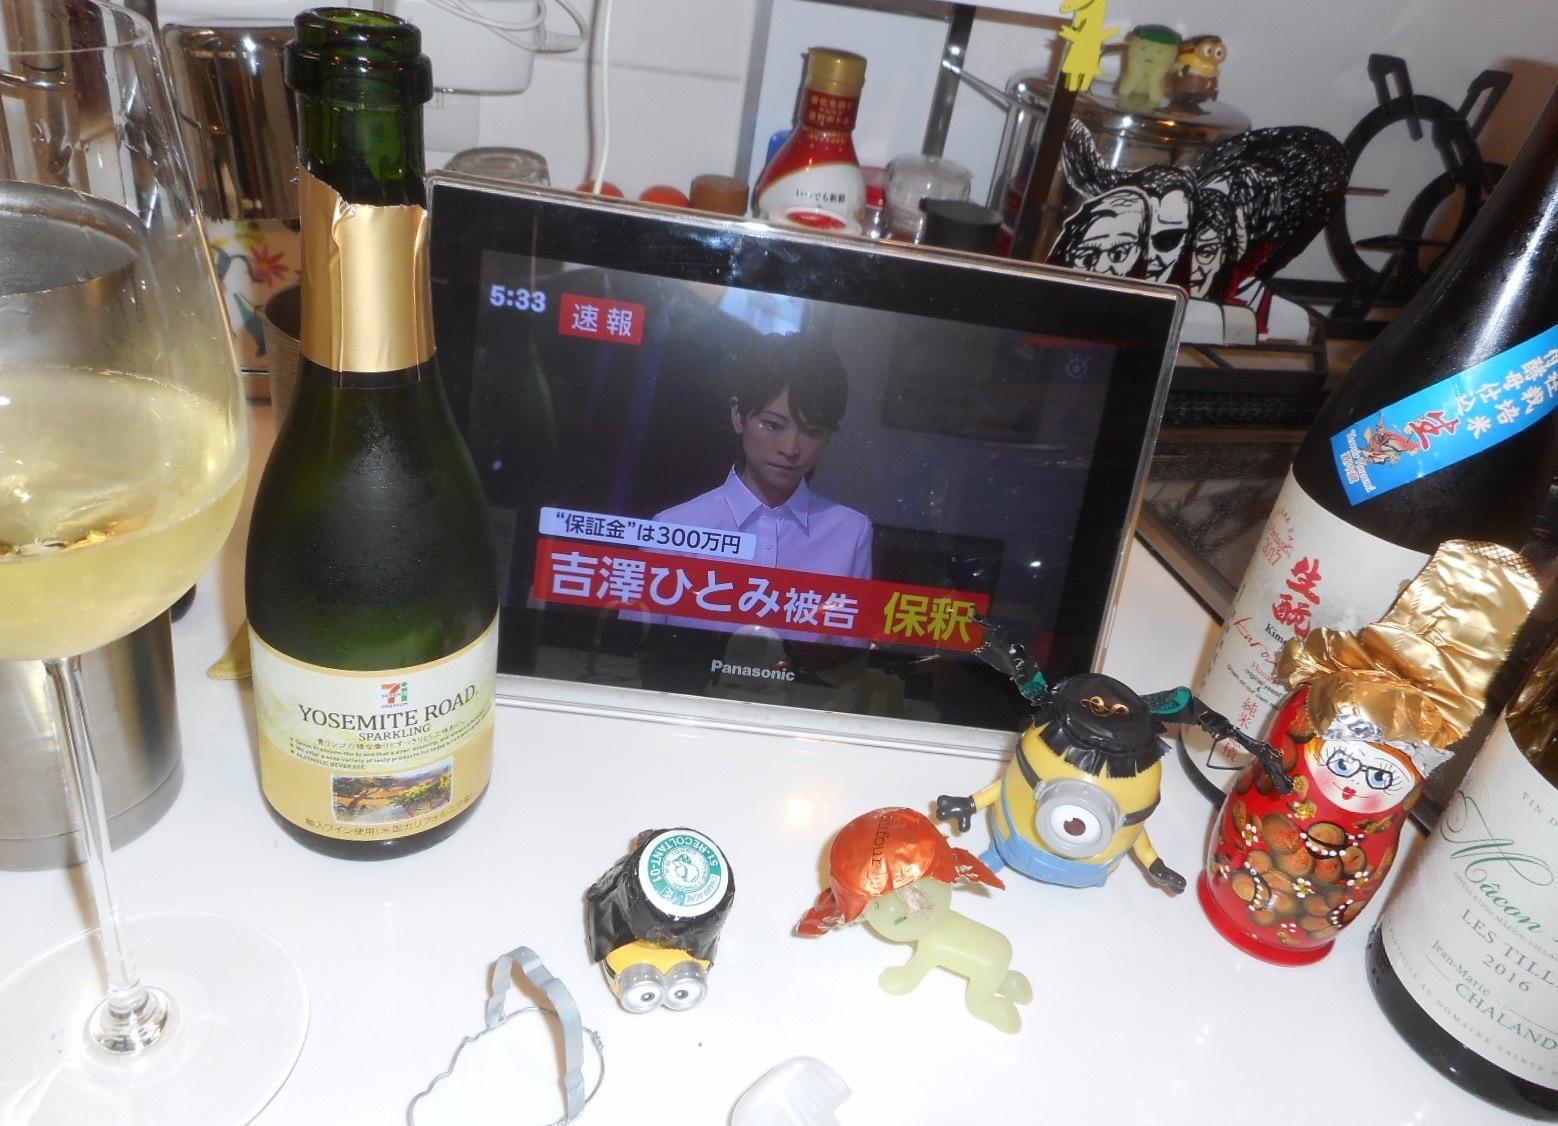 kurosawa_hozumi29by3_11.jpg